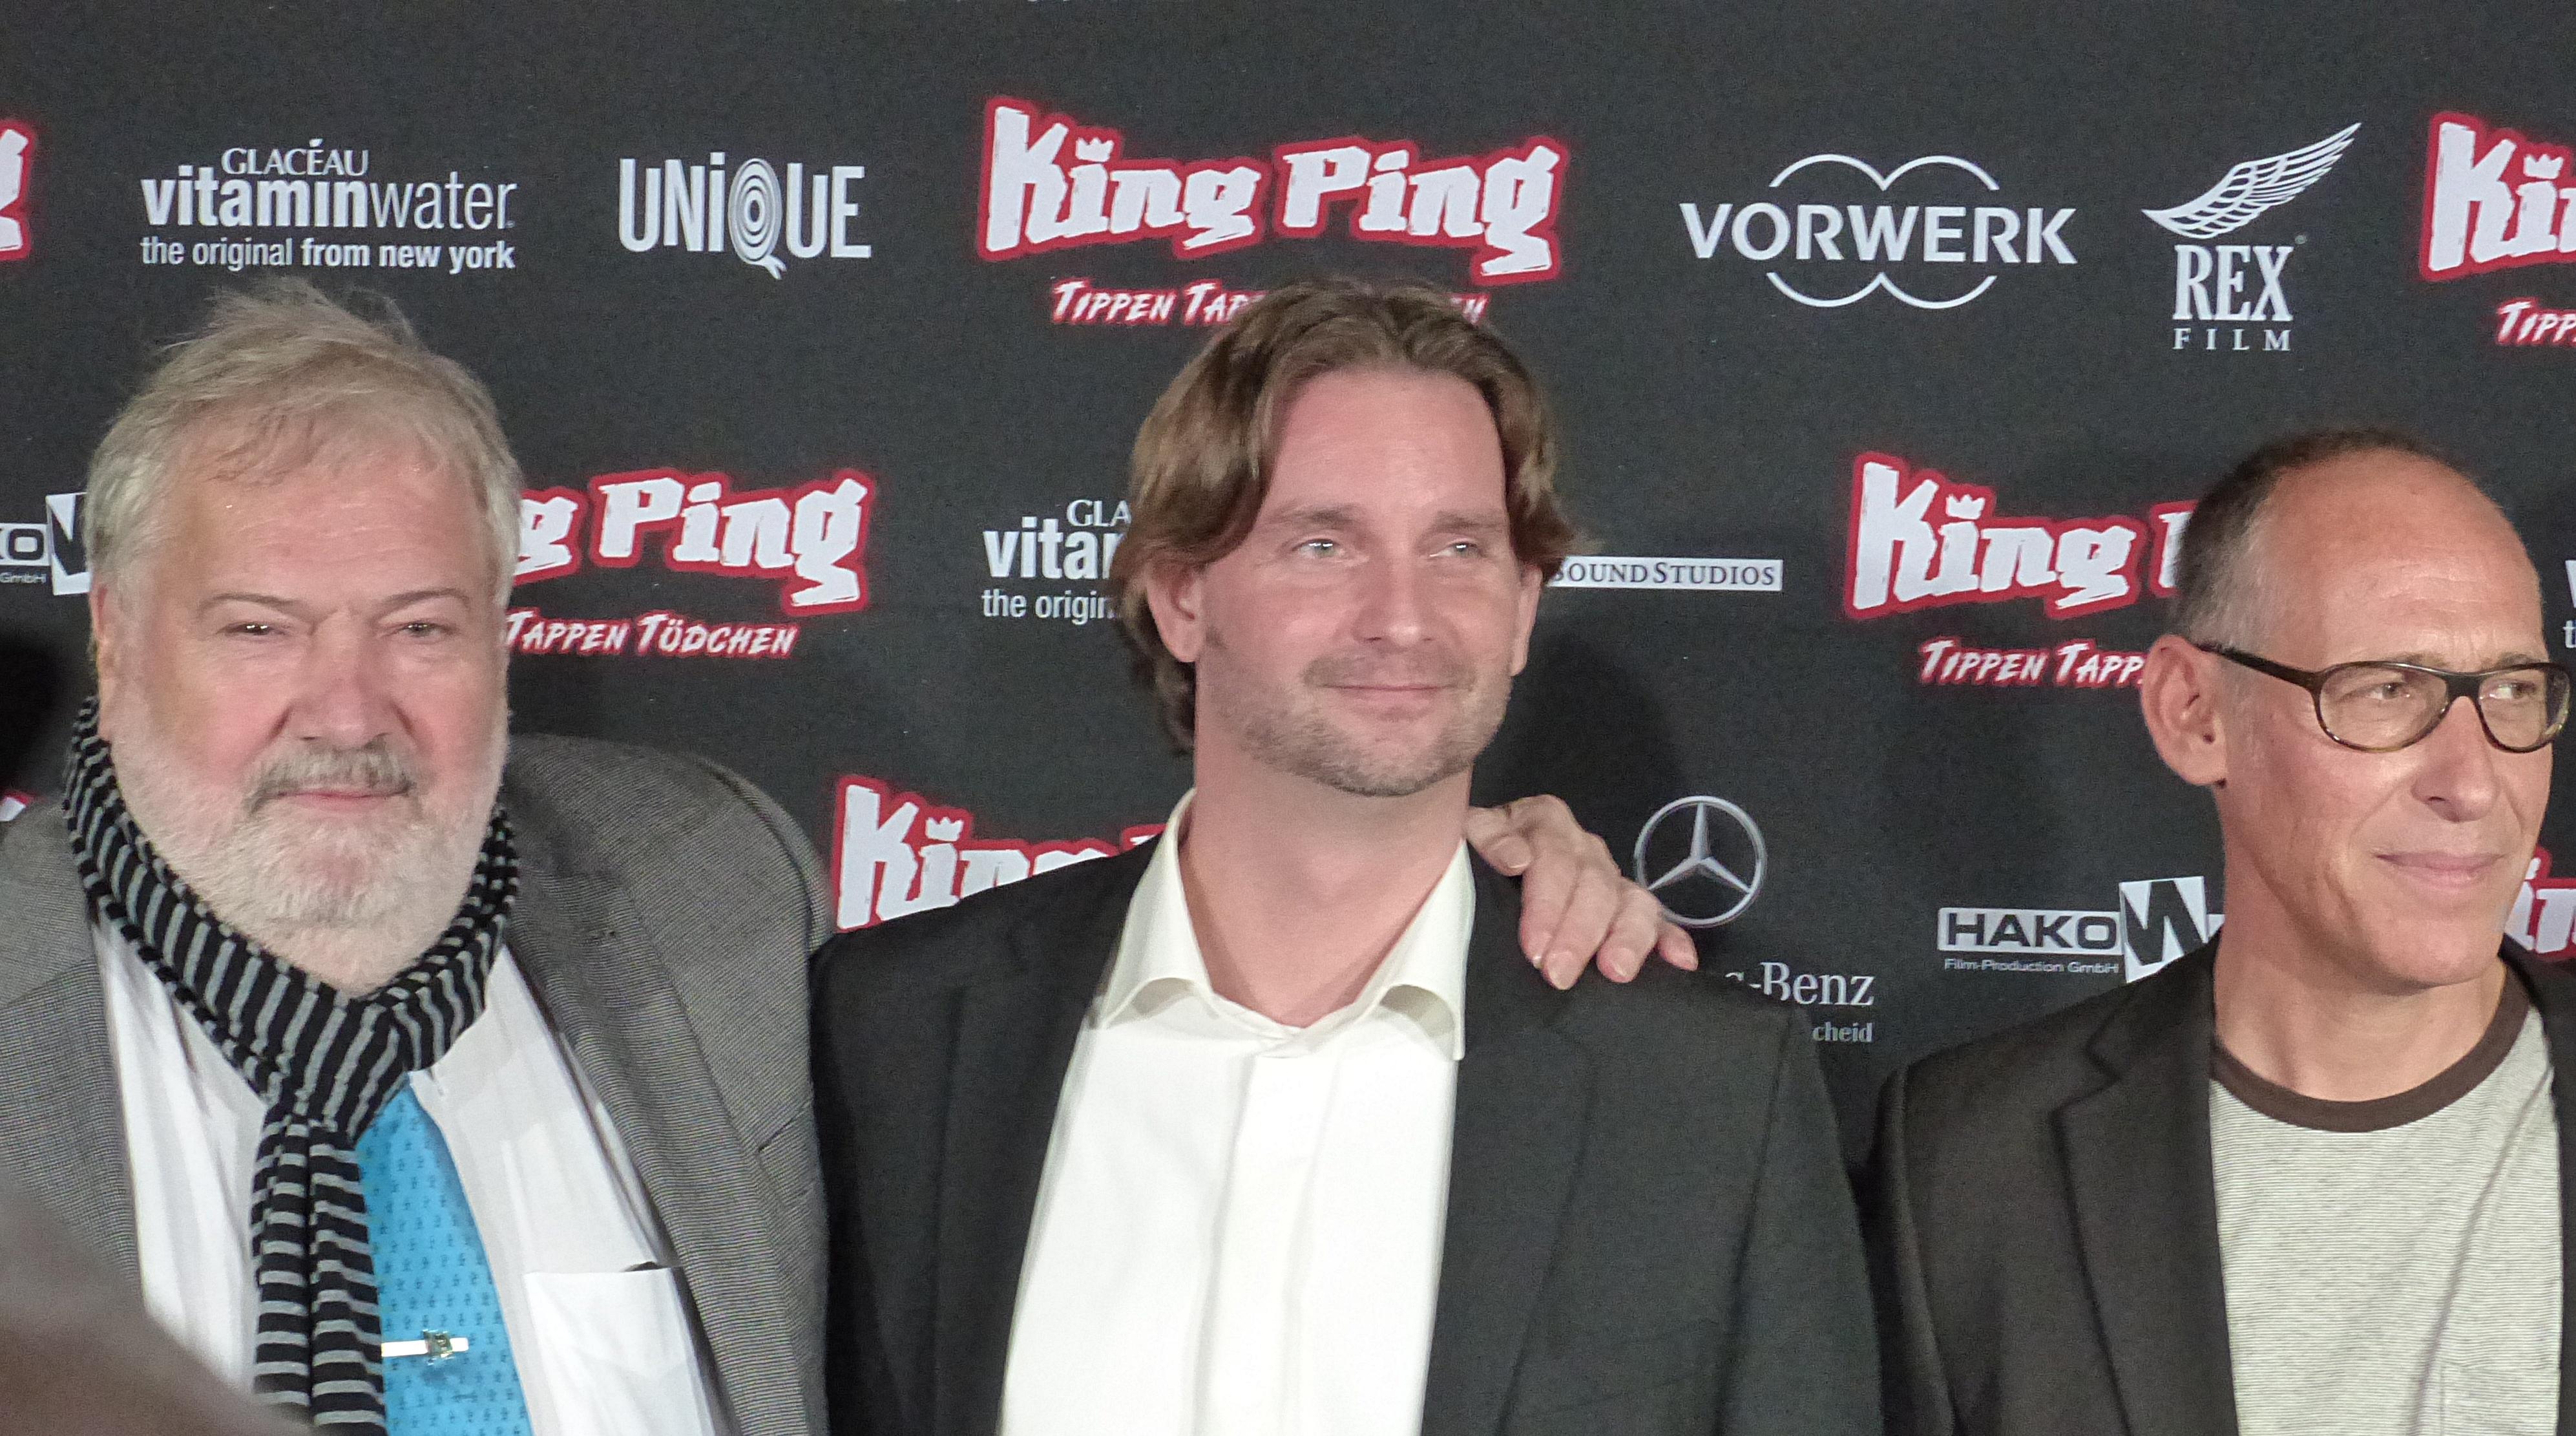 FileBernd Bigge Hako Media Christoph Schmidt Produktion Claude